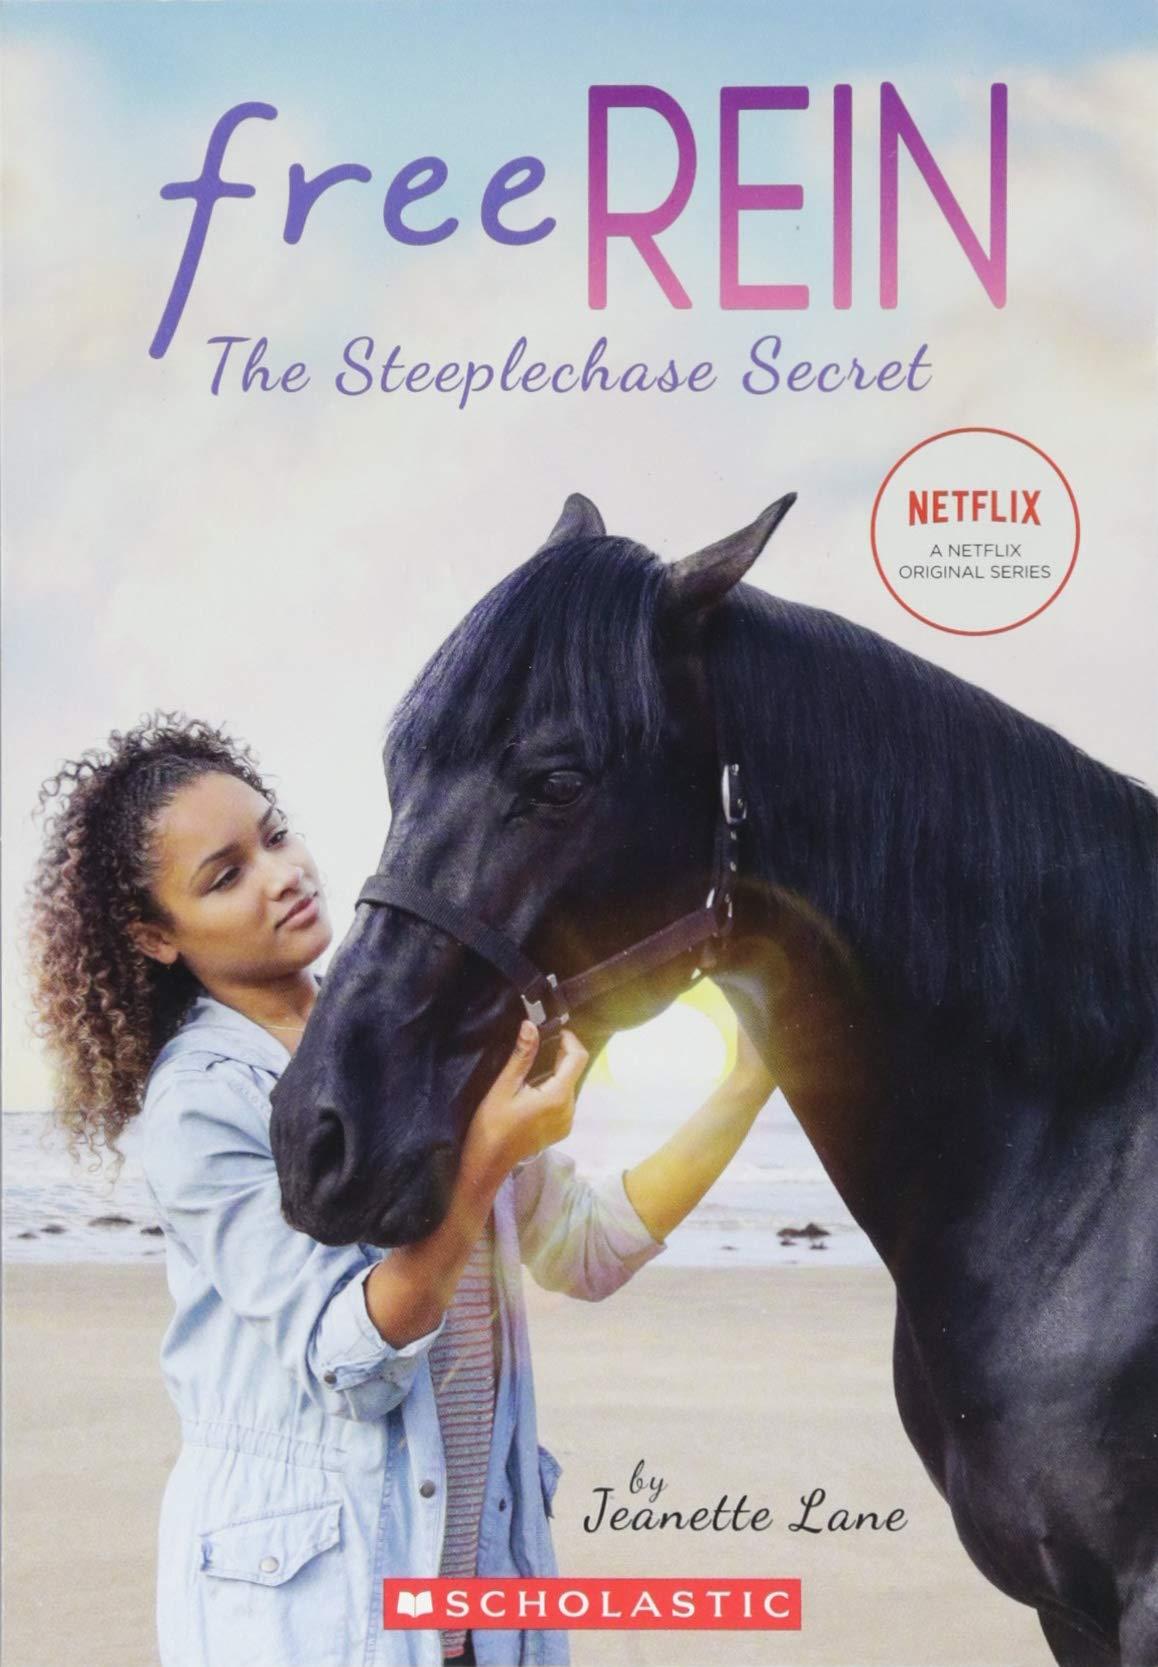 Download The Steeplechase Secret (Free Rein #1) pdf epub